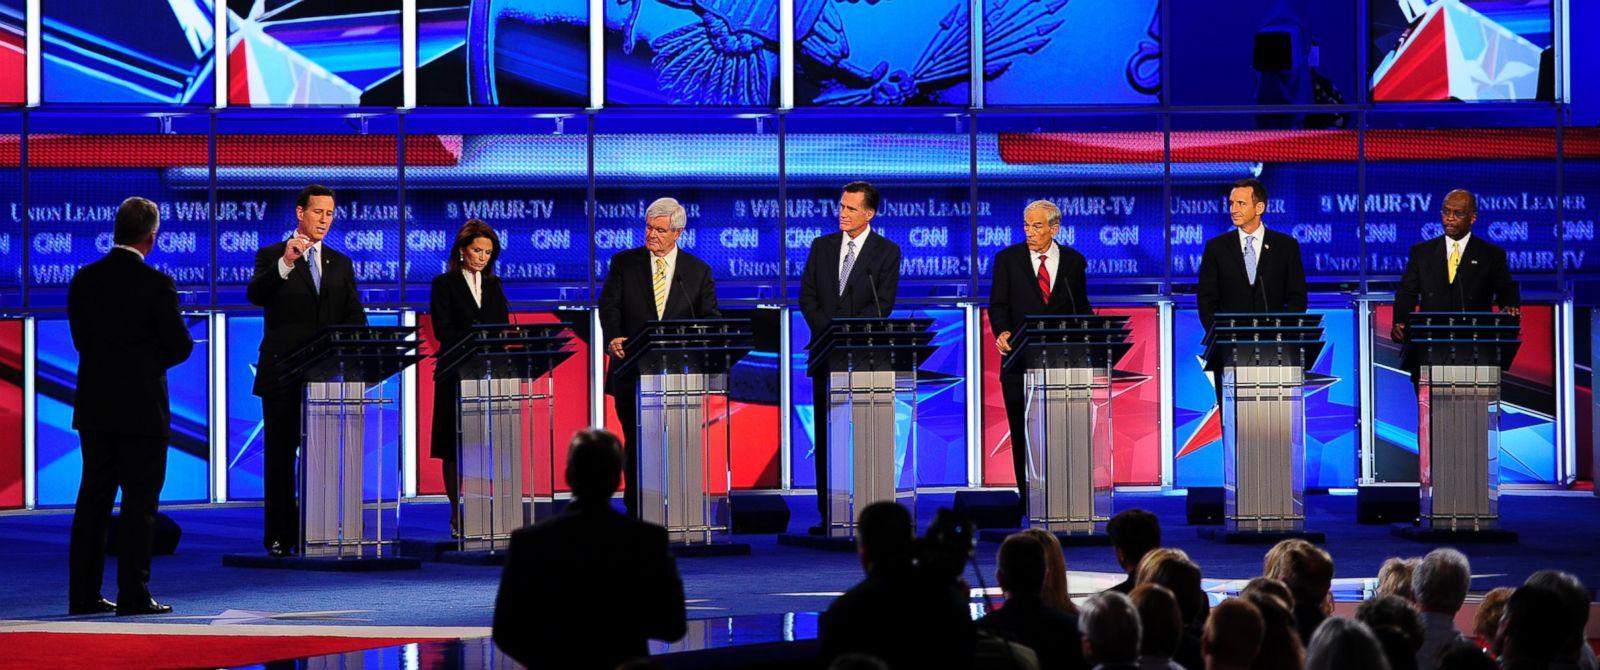 PHOTO: (L-R) Rick Santorum, Michele Bachmann, Newt Gingrich, Mitt Romney, Ron Paul, Tim Pawlenty, Herman Cain address the first 2012 Republican presidential candidates debate in Manchester, New Hampshire, June 13, 2011.